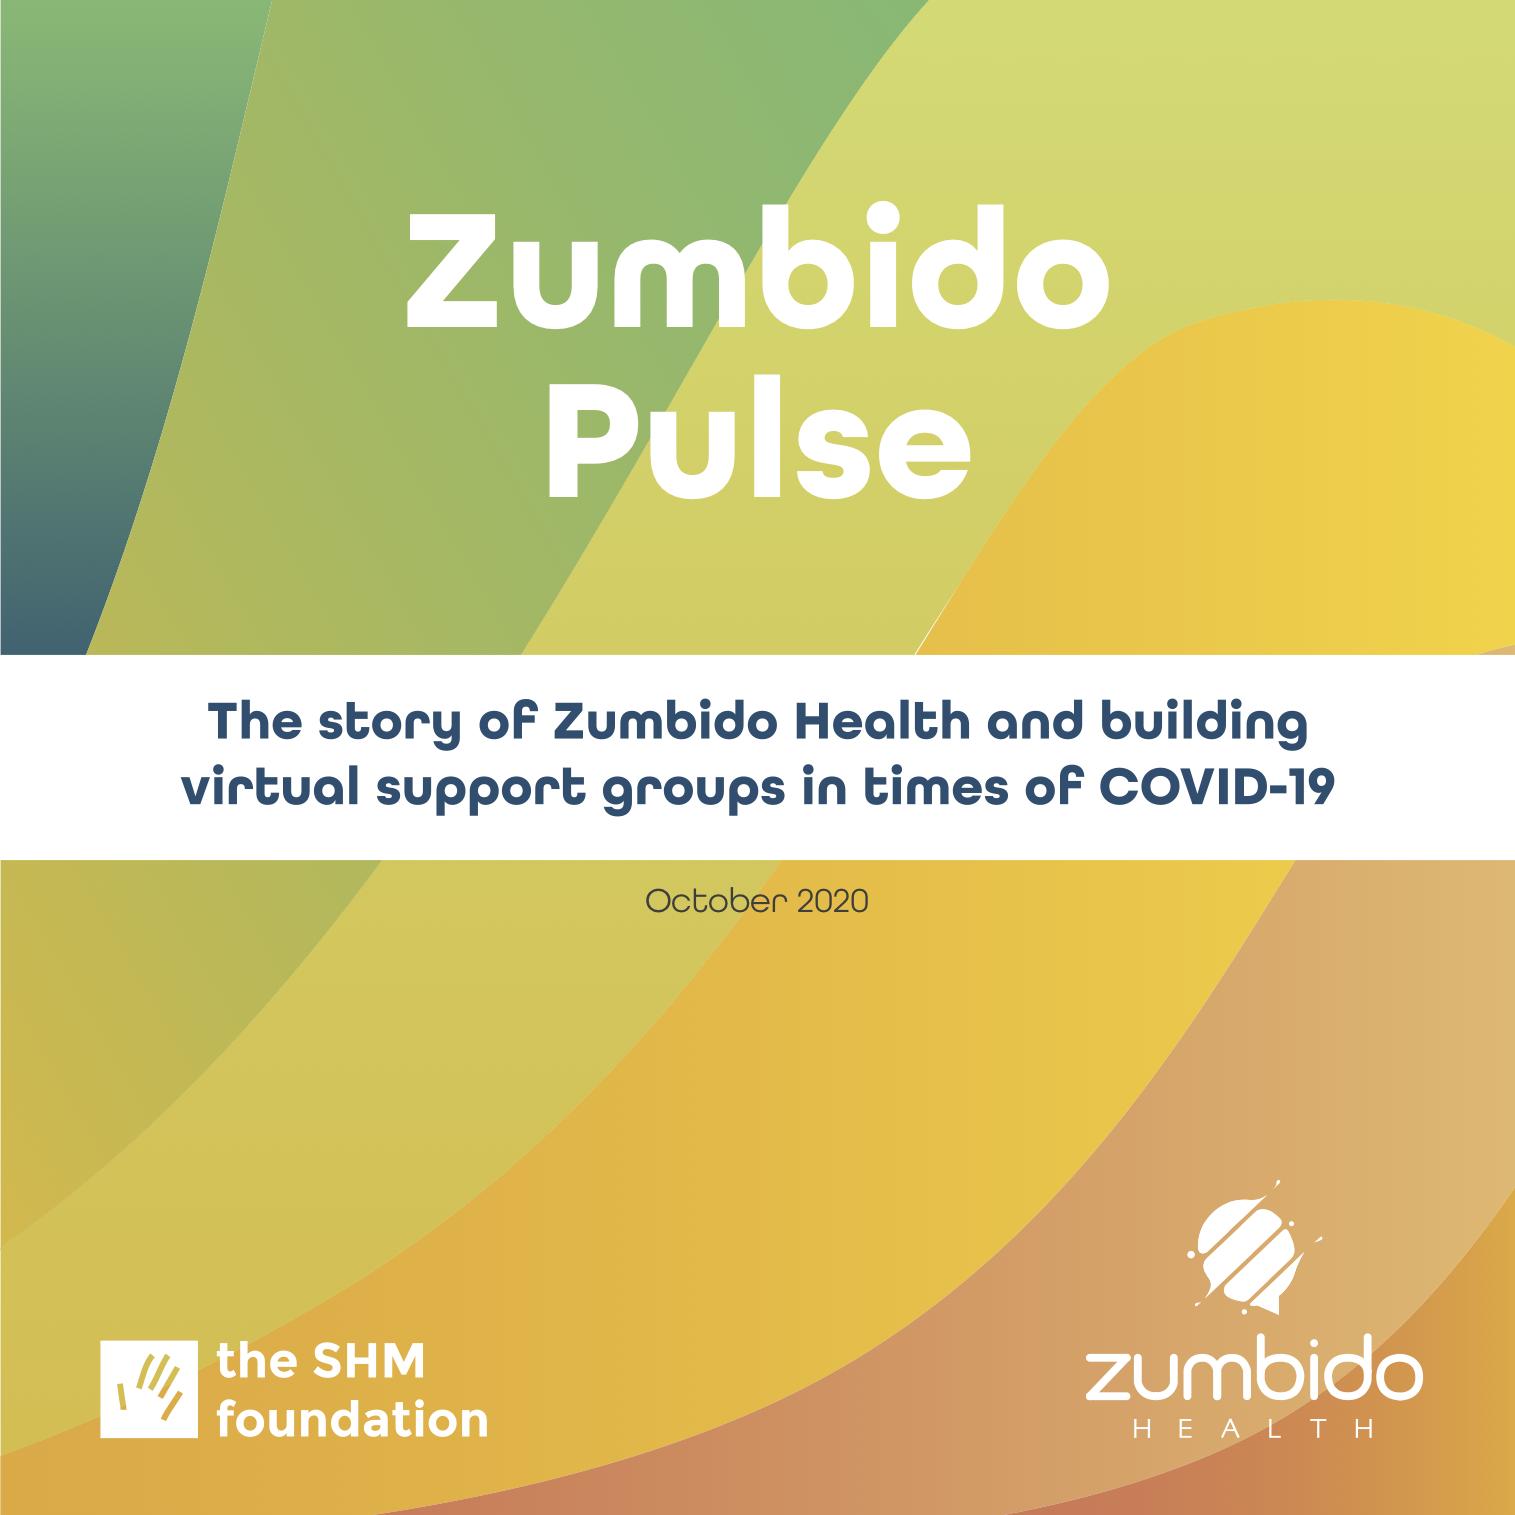 Zumbido Pulse OCT